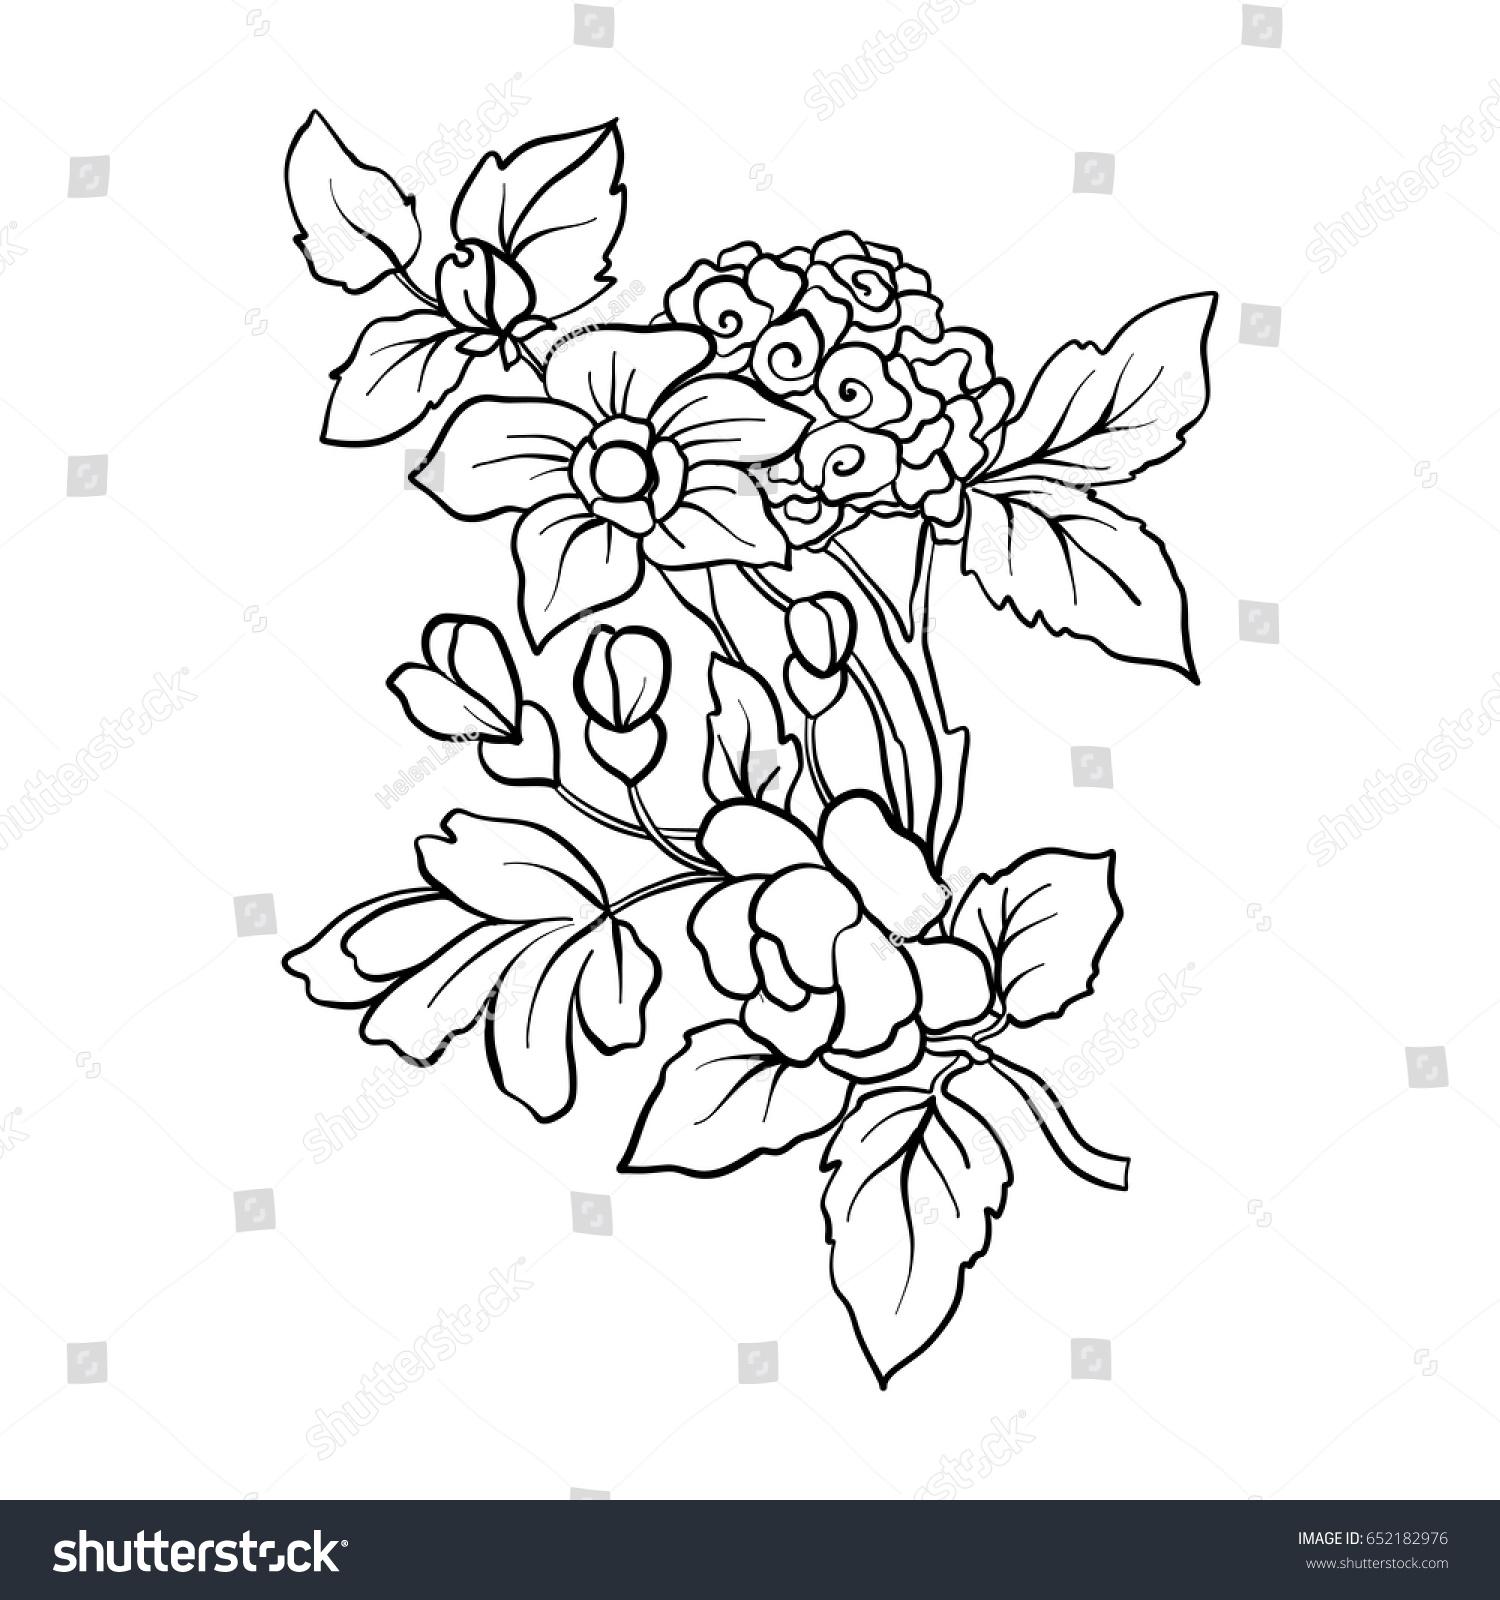 Outline vintage flowers bouquet or pattern ez canvas id 652182976 izmirmasajfo